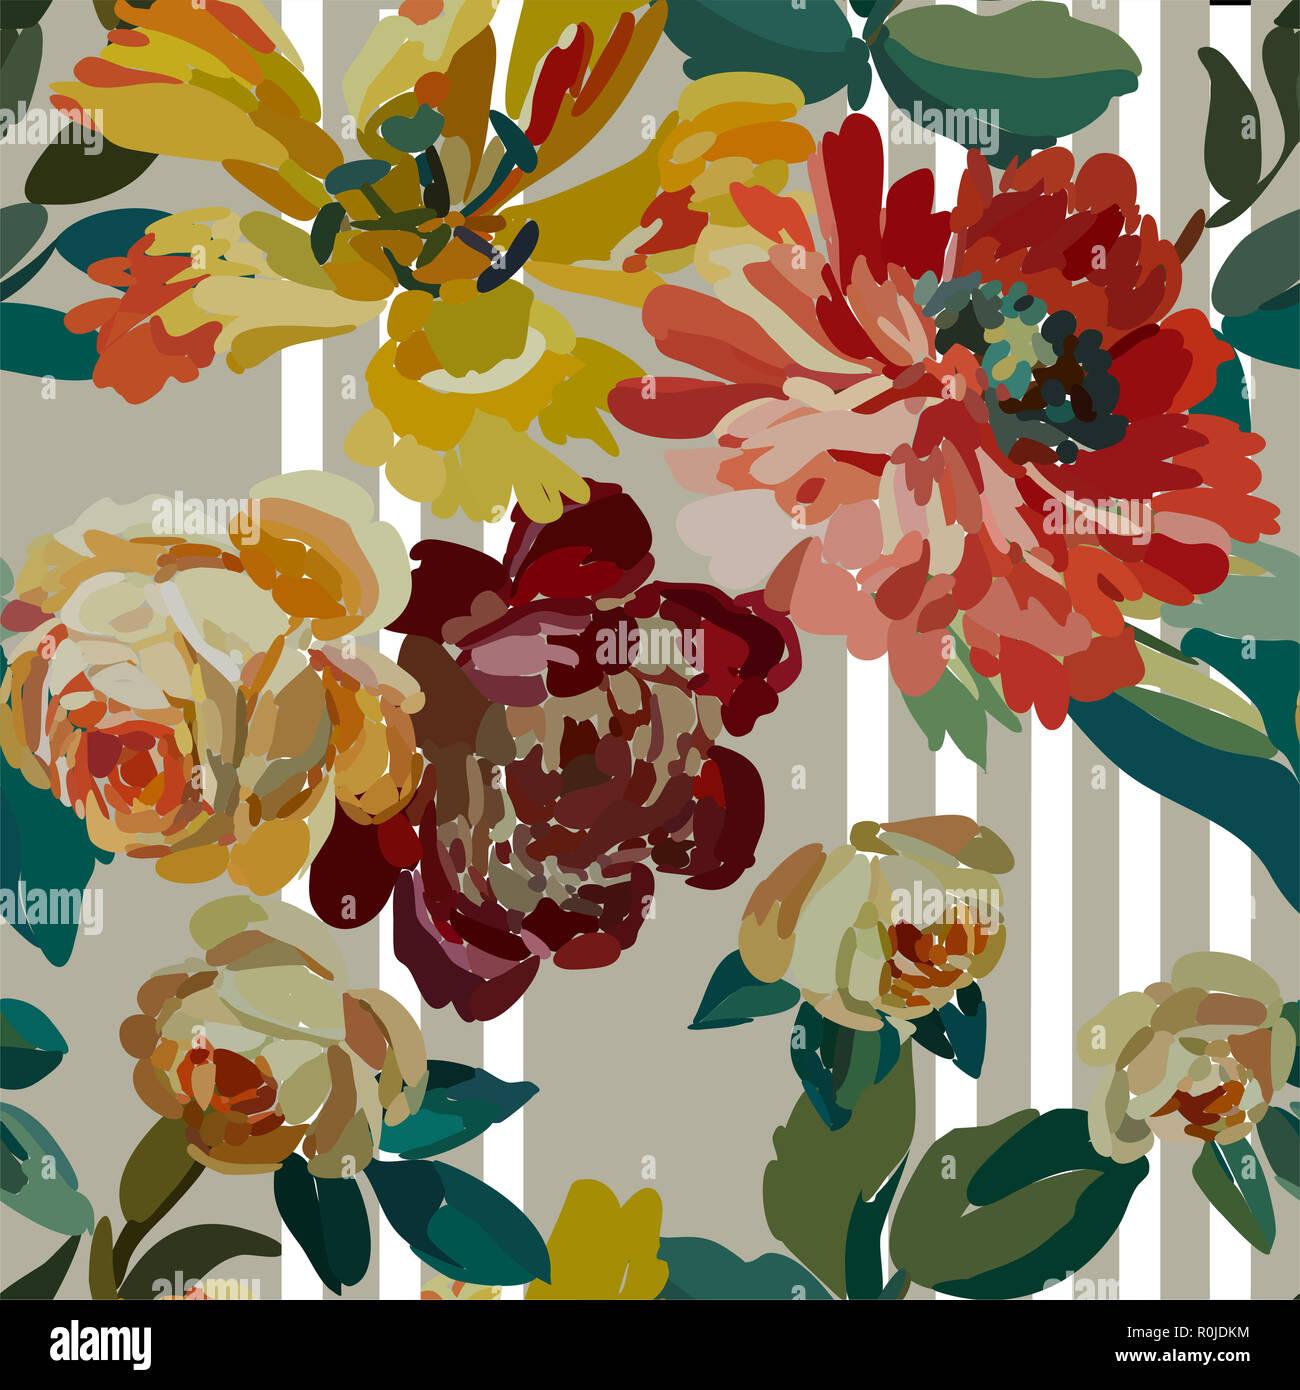 Vintage Floral Seamless Background Pattern Blooming Garden